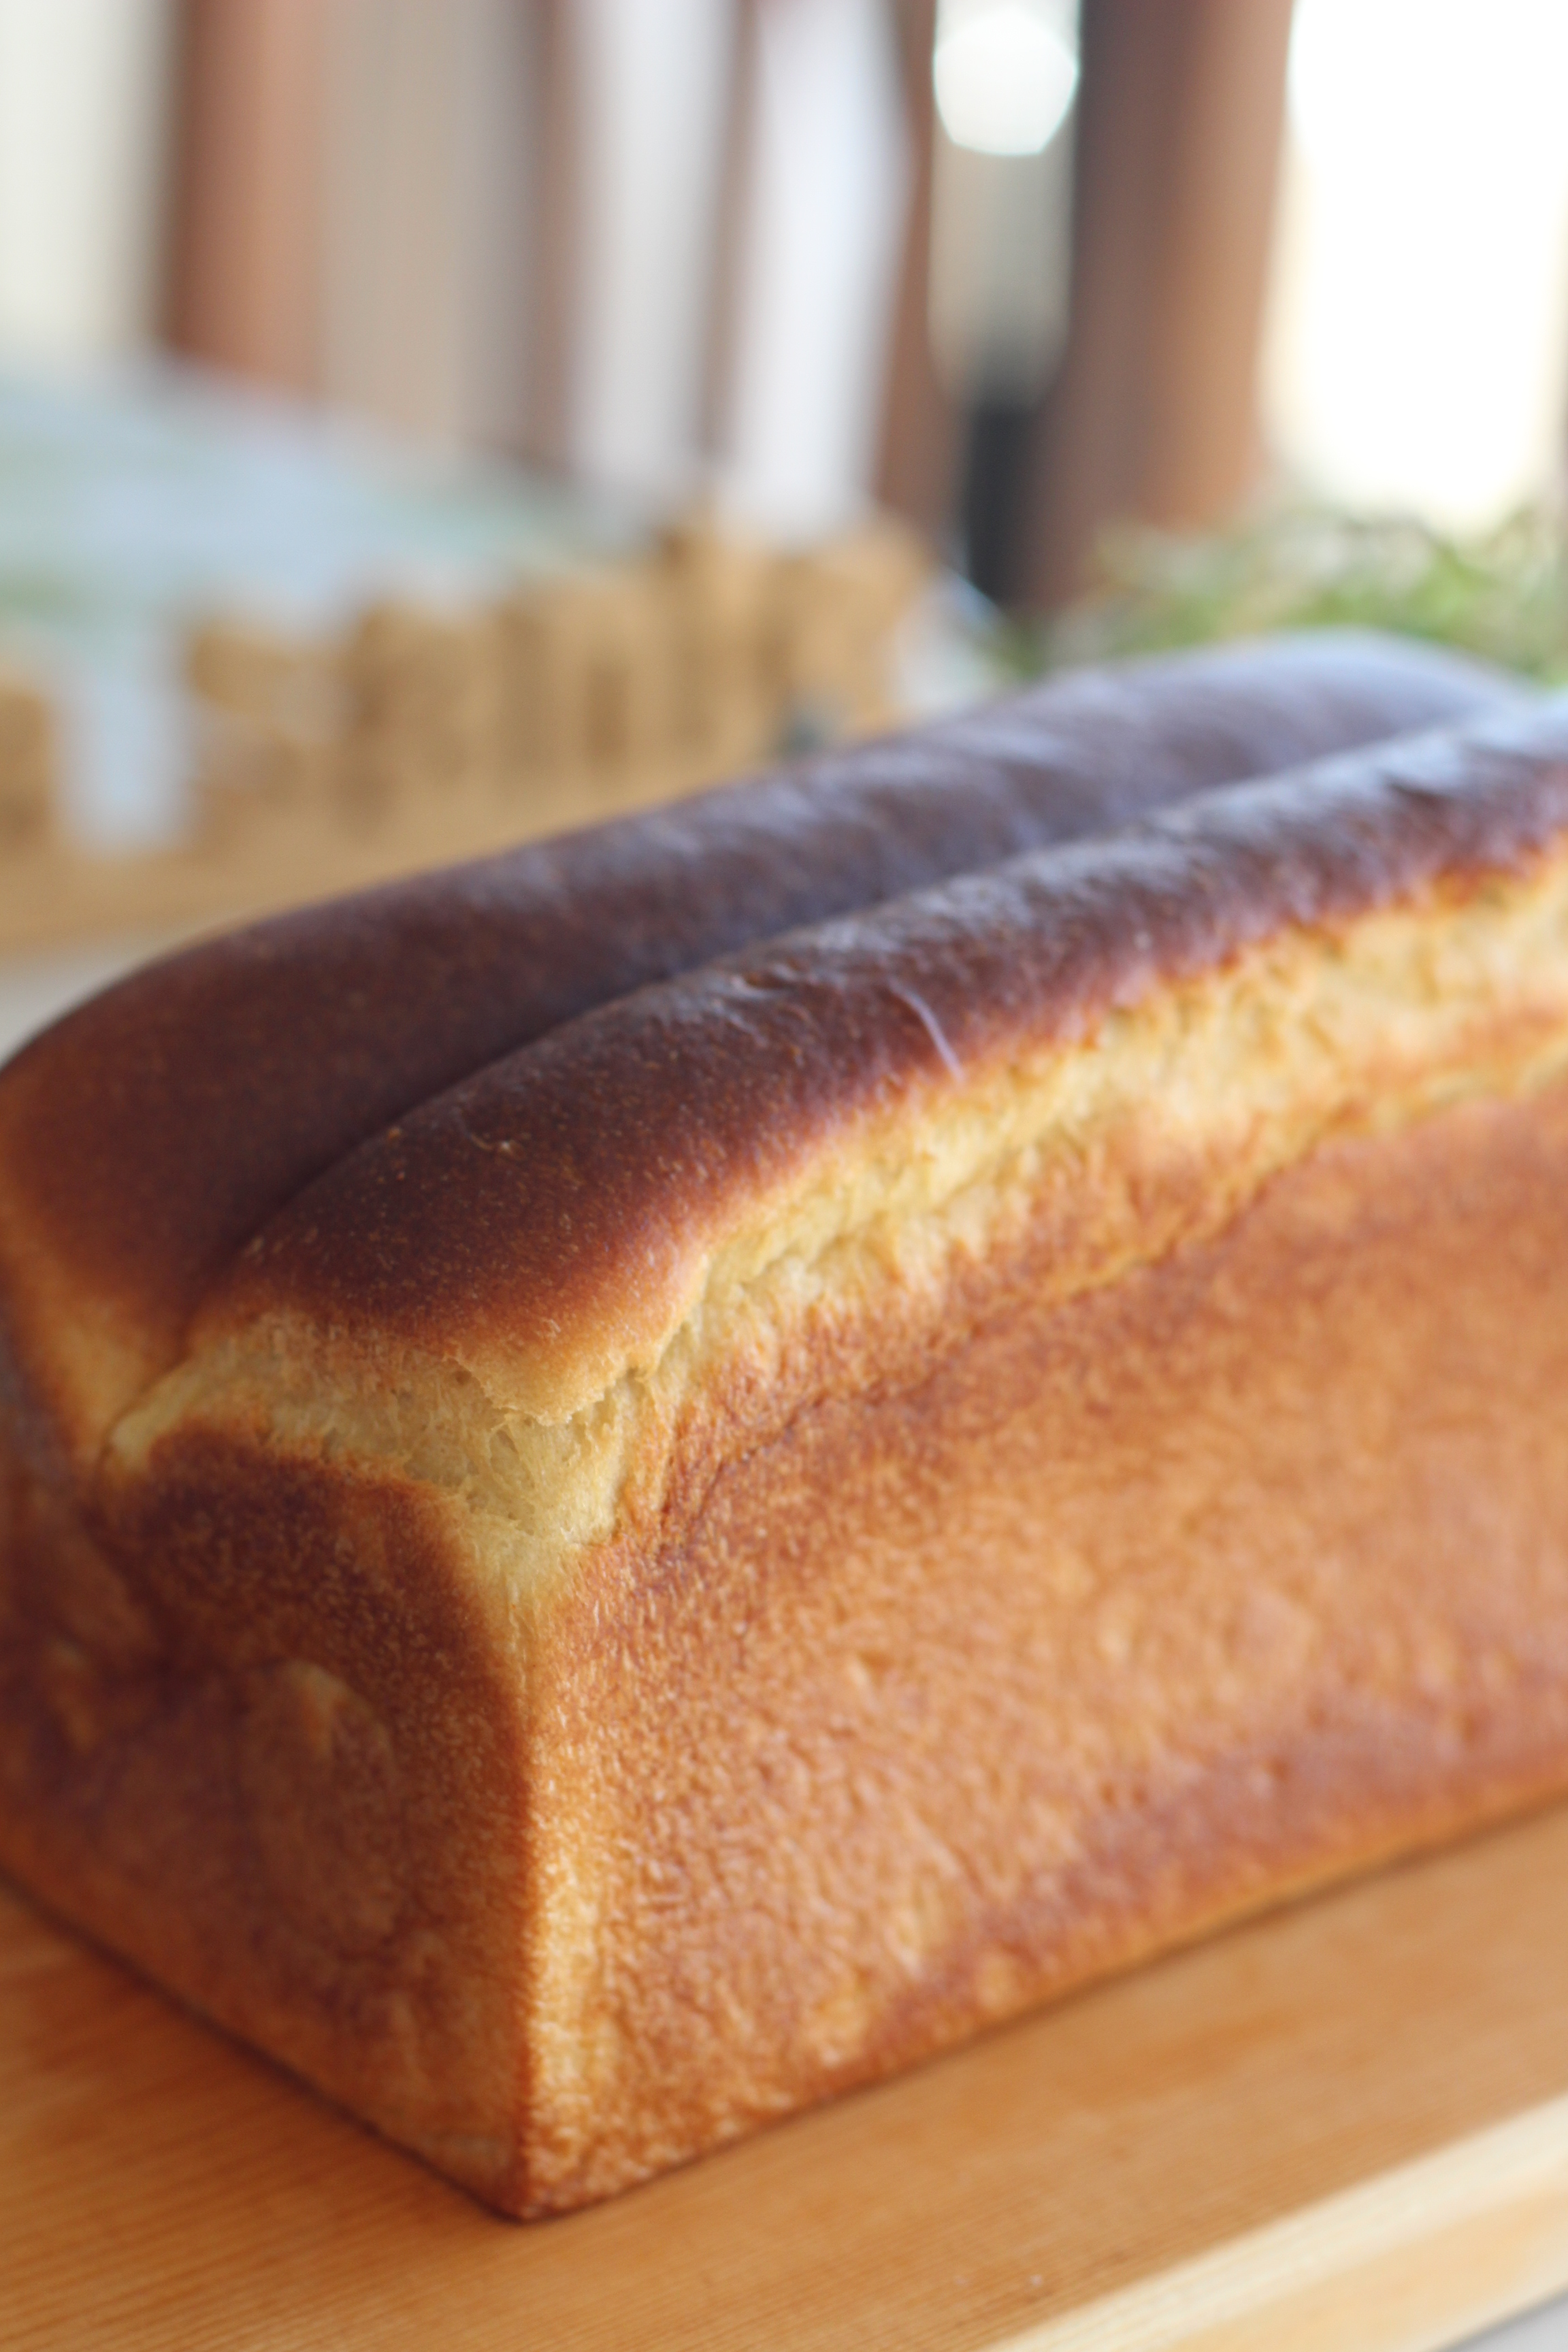 a-ta-sante糖質制限パン料理教室、阿倍野区西田辺。京都江部粉糖質制限パン変わり山食完成。